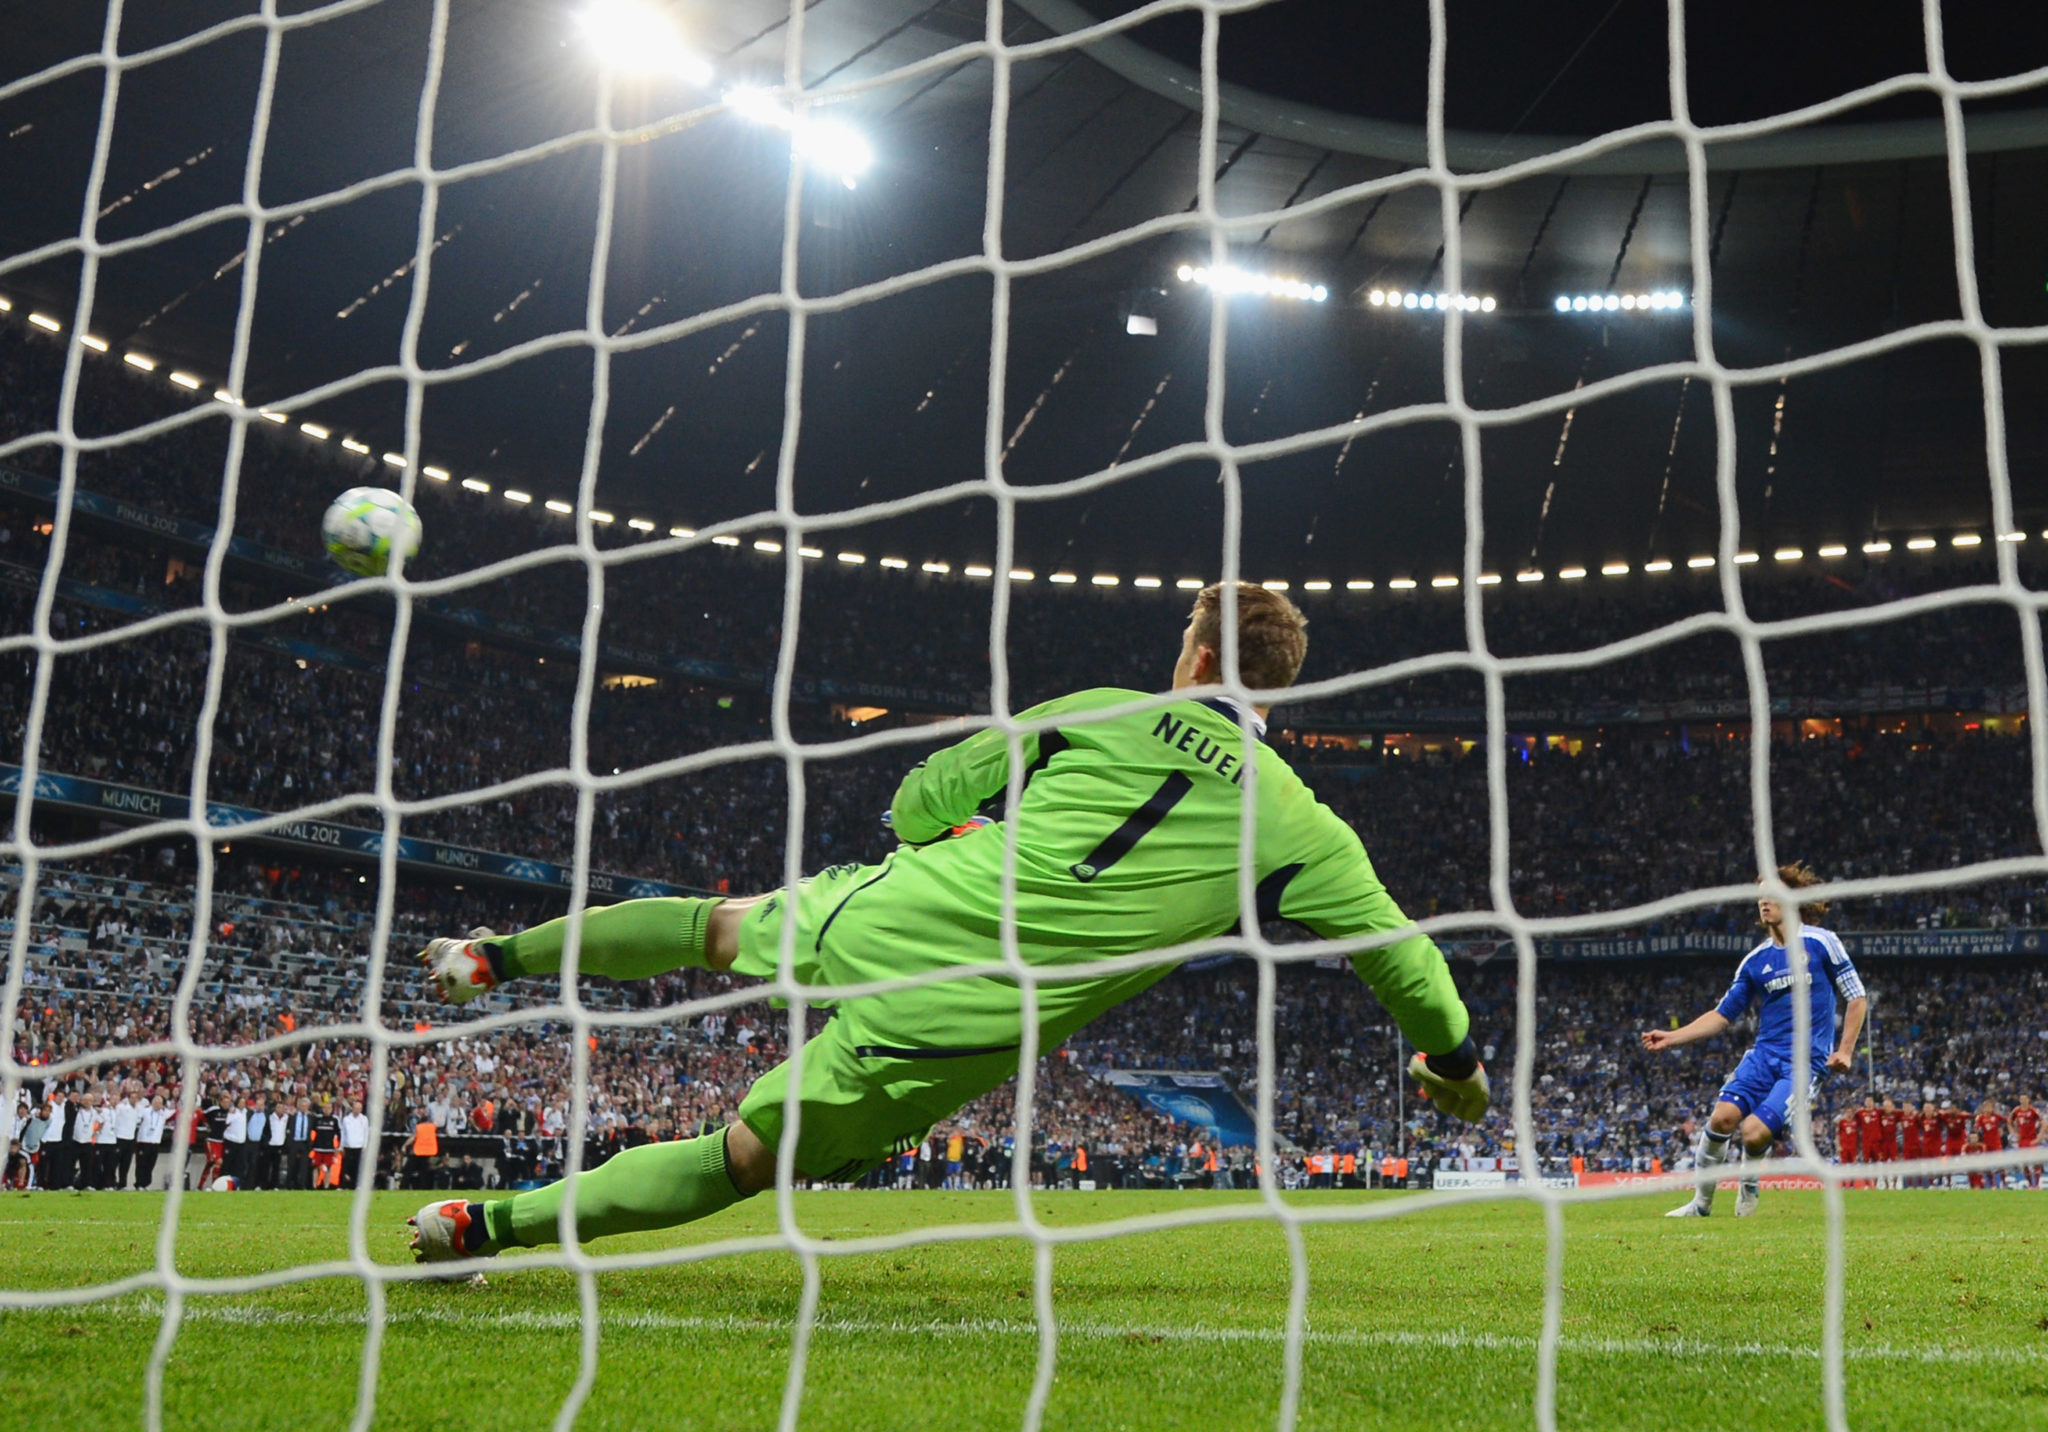 Niederlage gegen Chelsea zu Hause im Penalty Shoot-out.